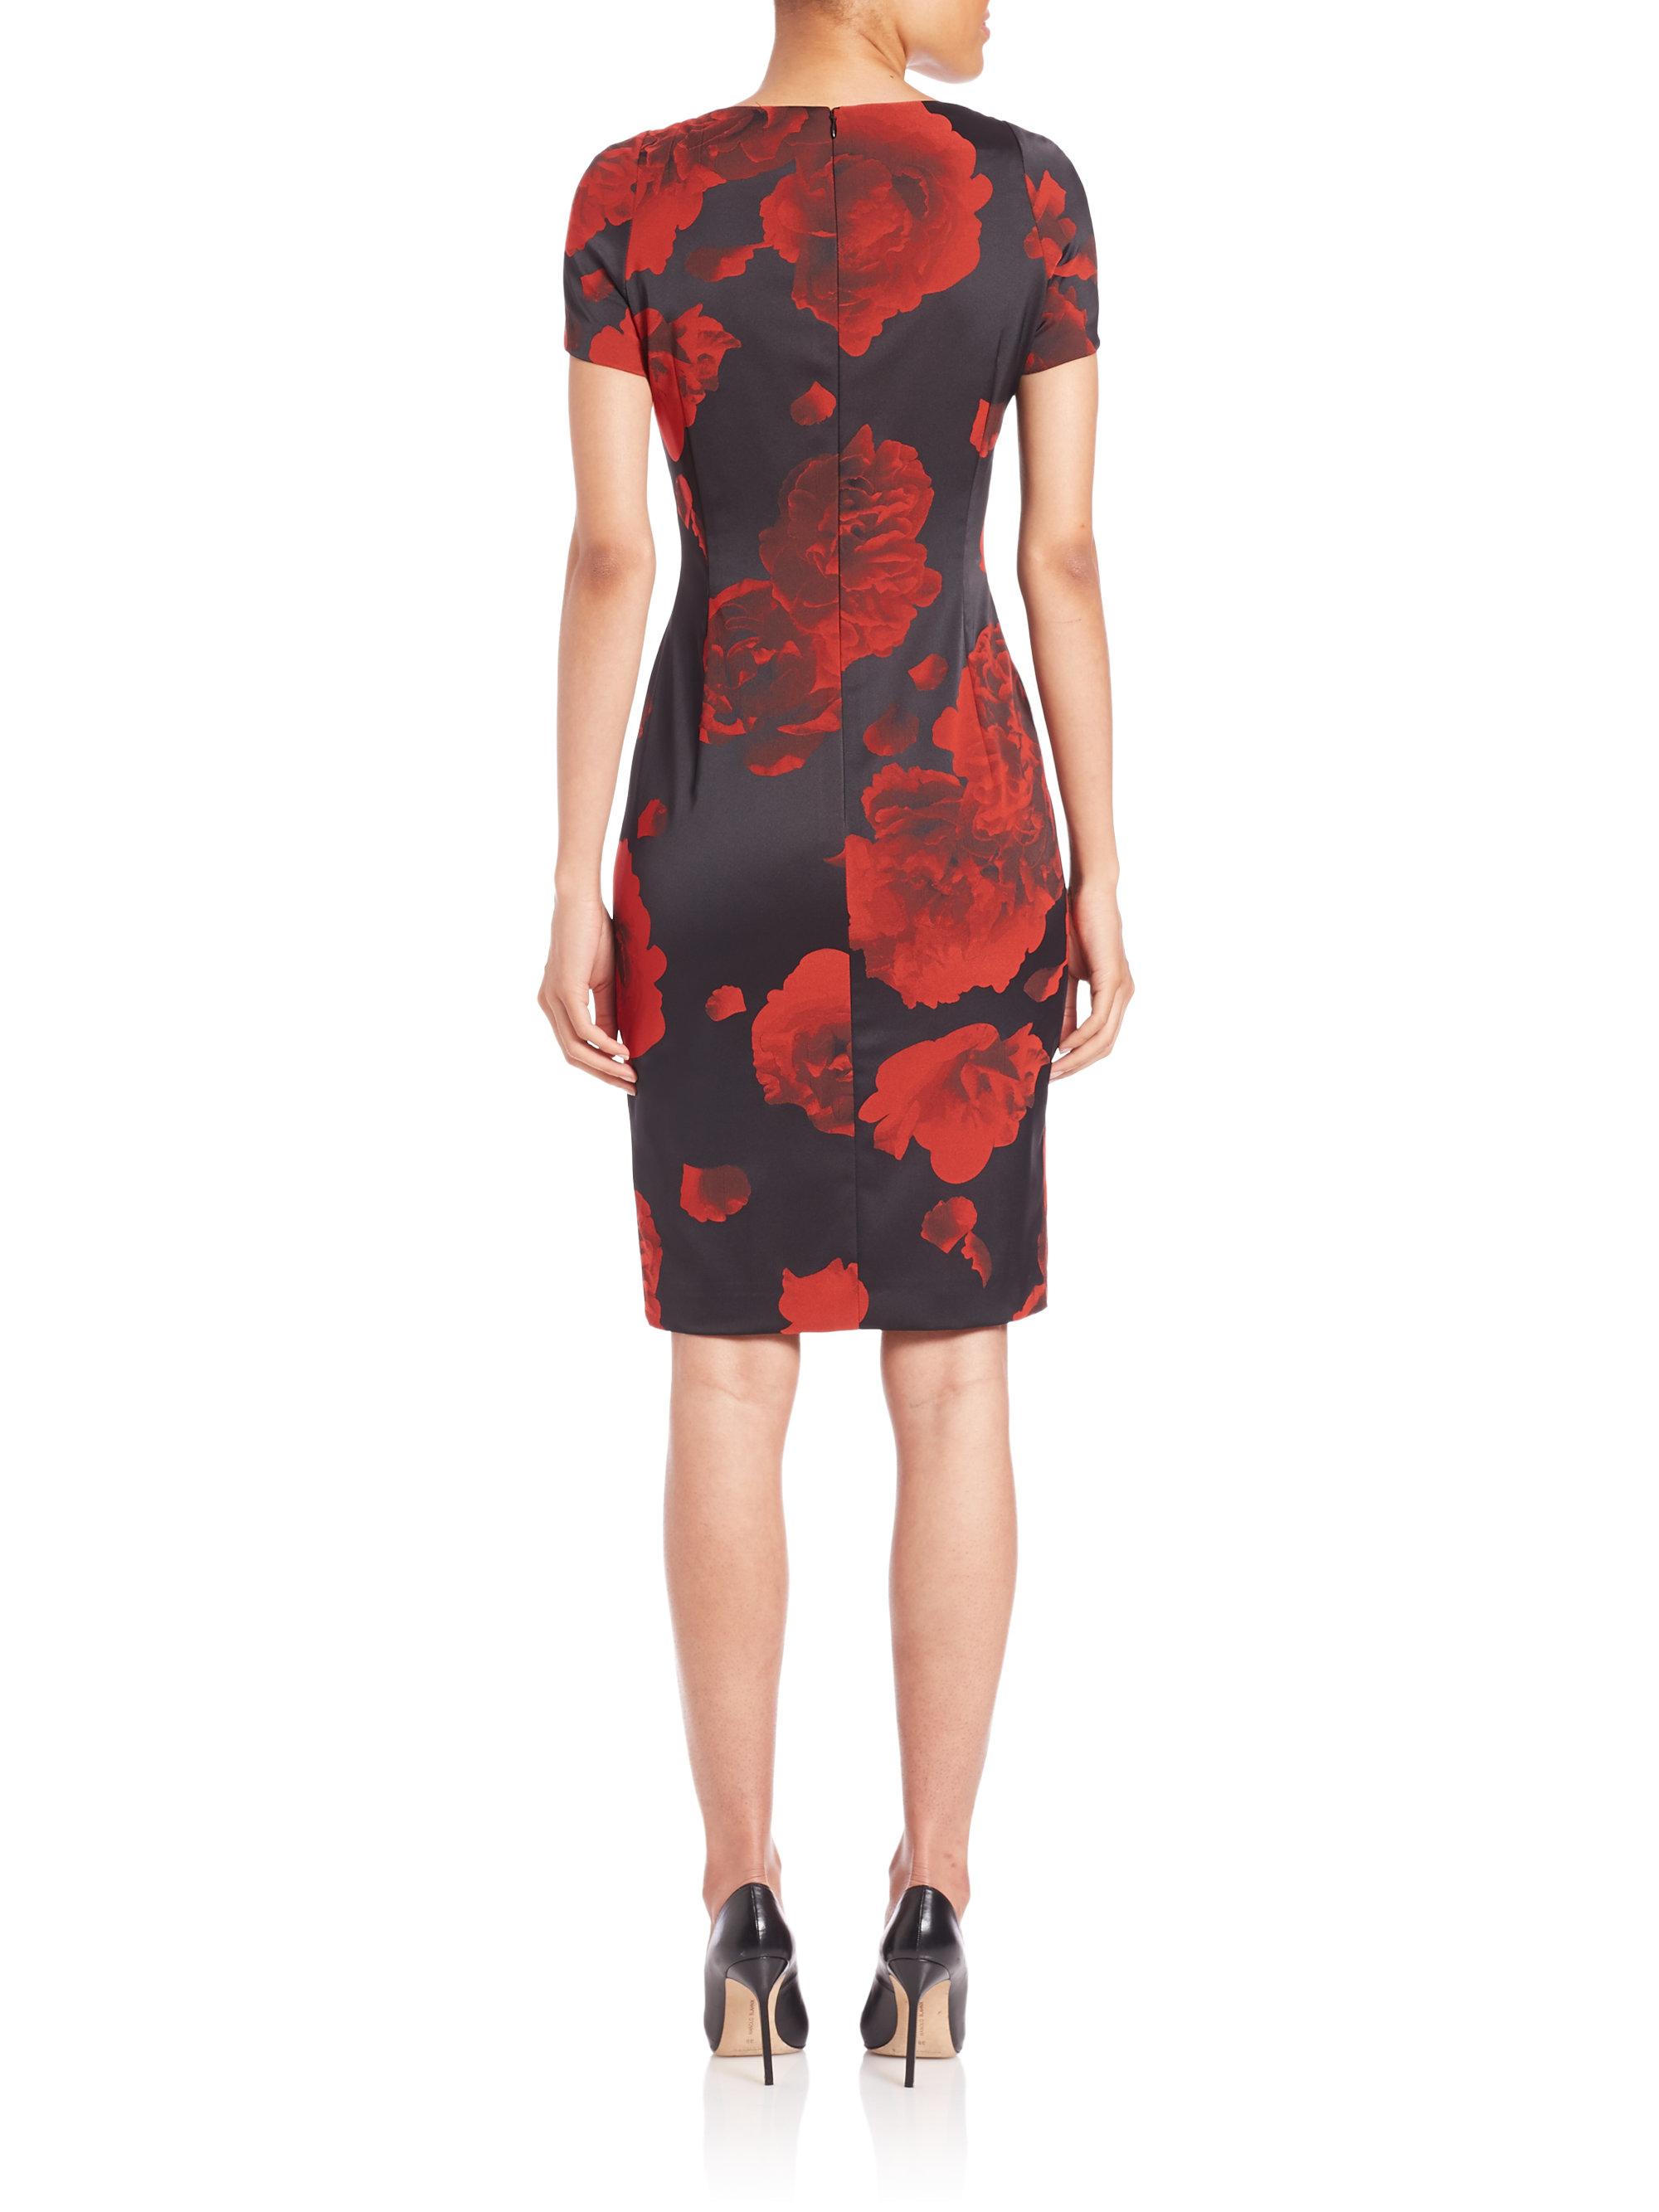 Lyst - Escada Rose-print Dress in Red